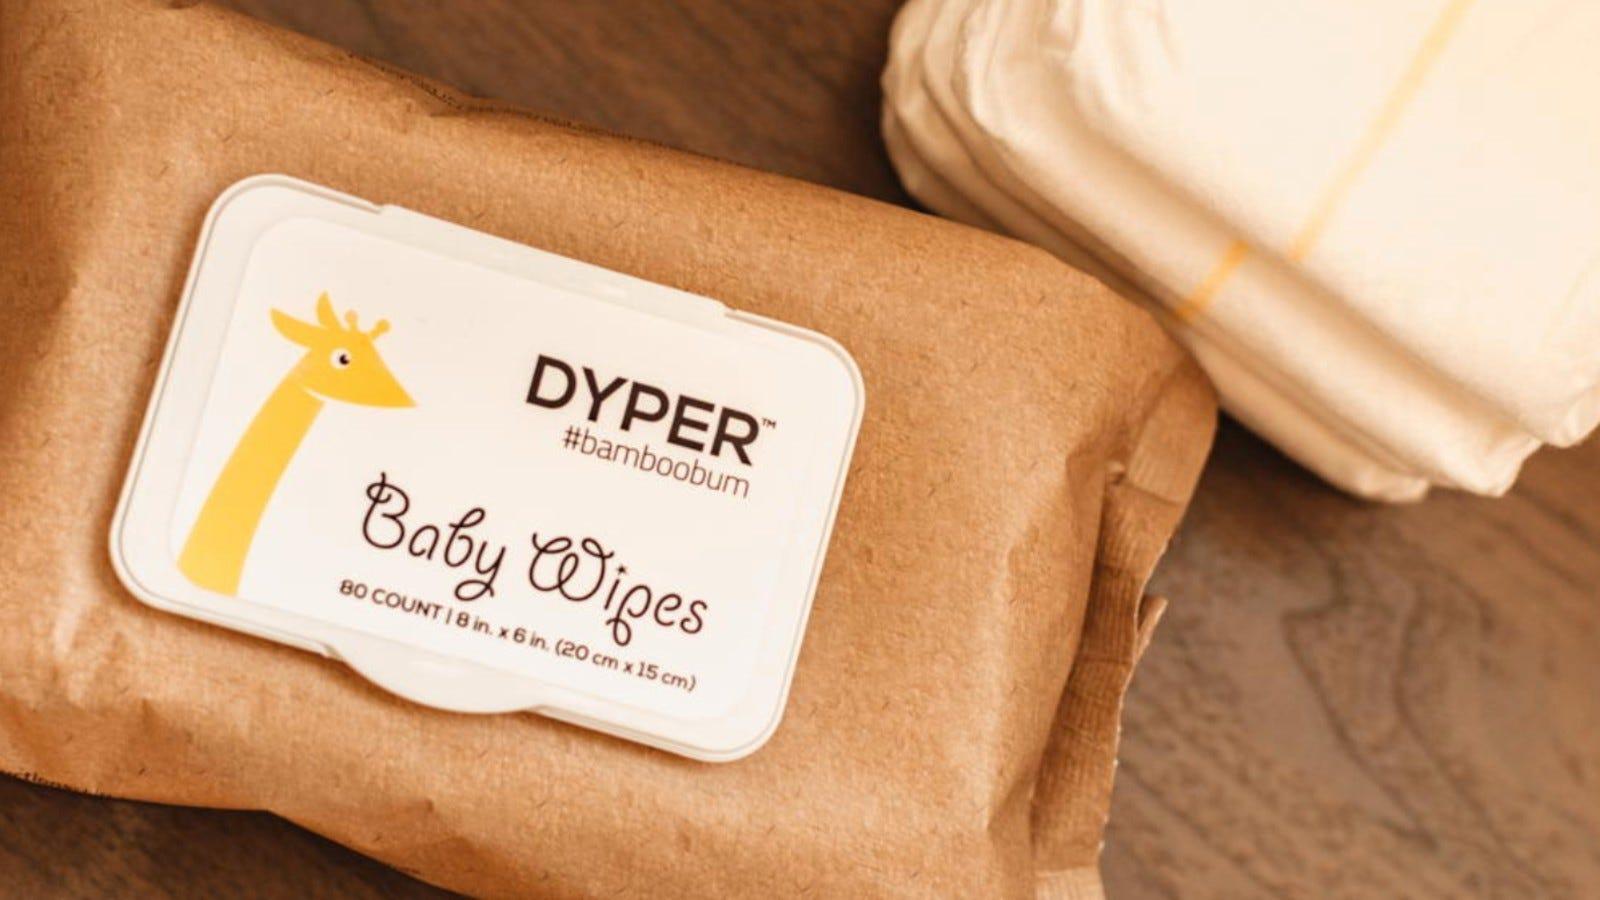 Dyper wipes